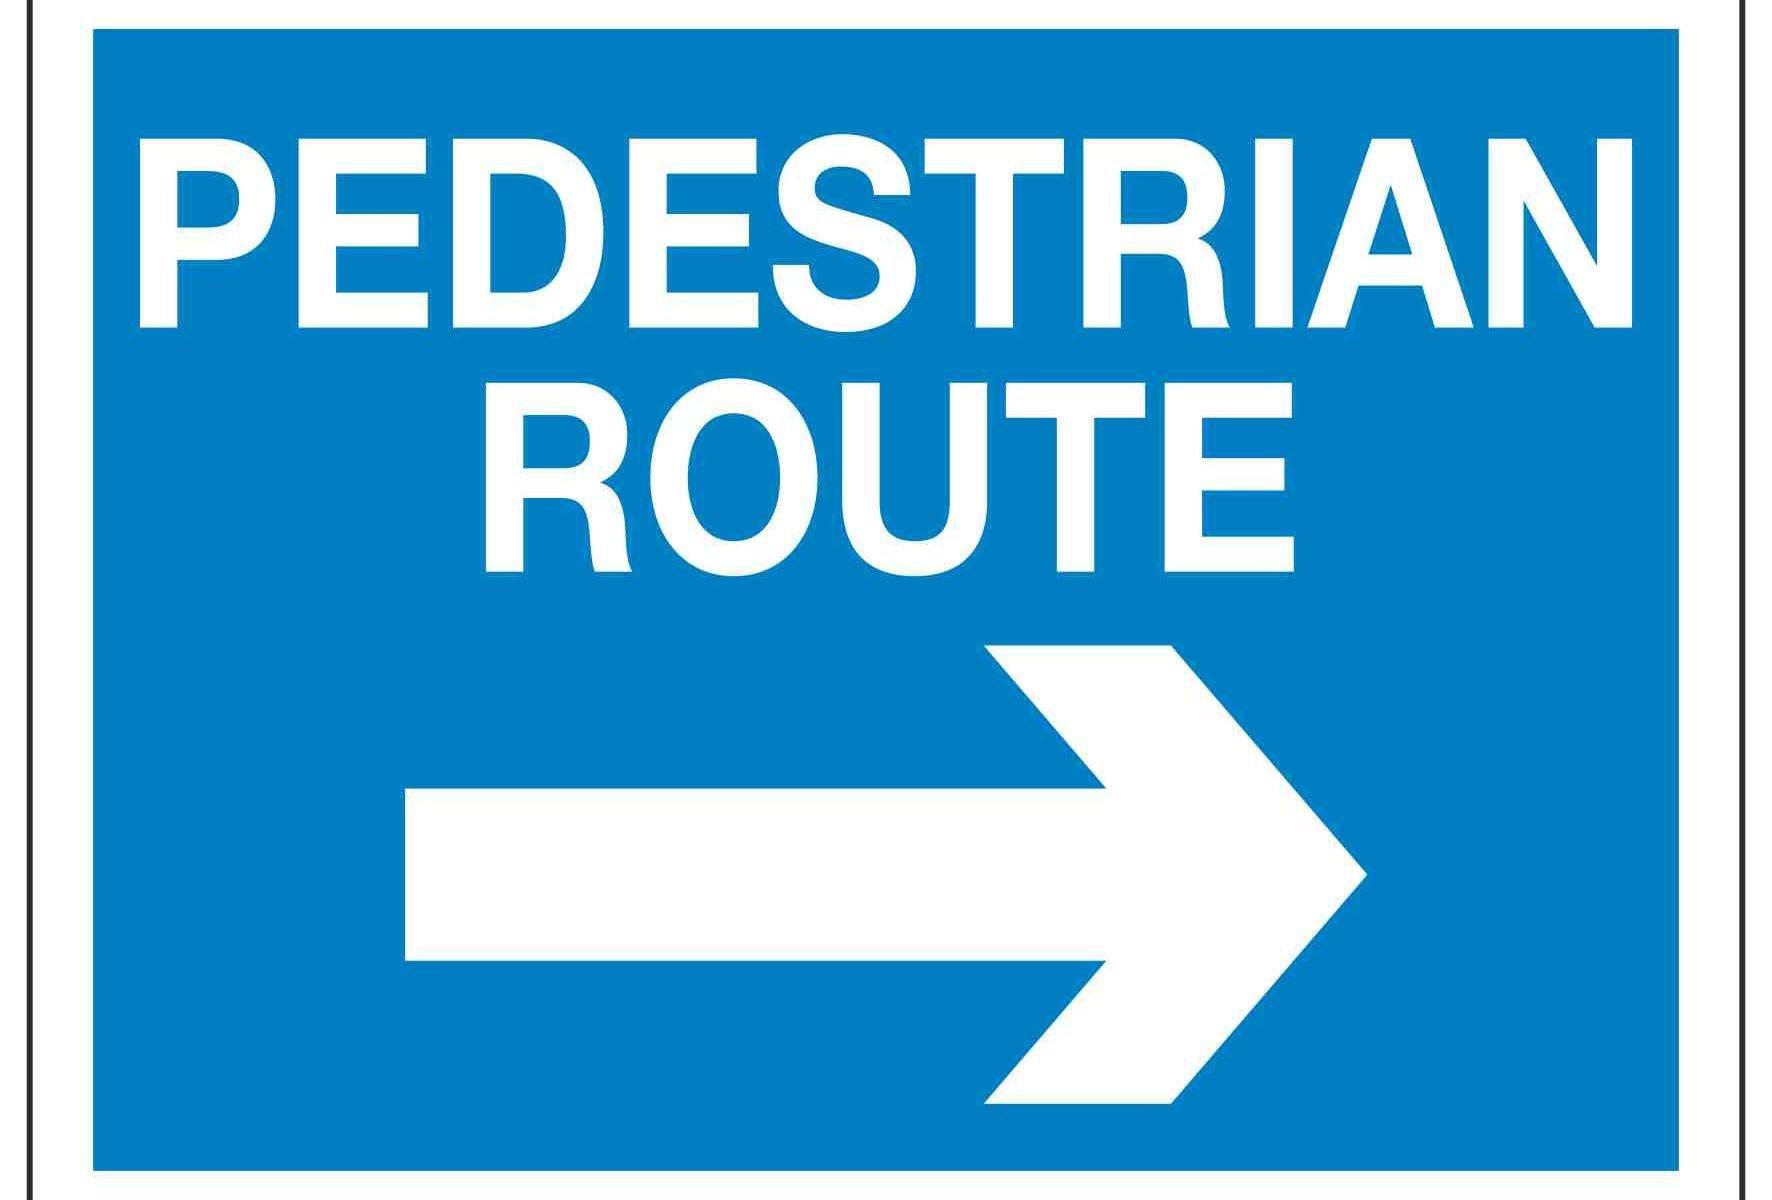 PEDESTRIAN ROUTE (Arrow Right)